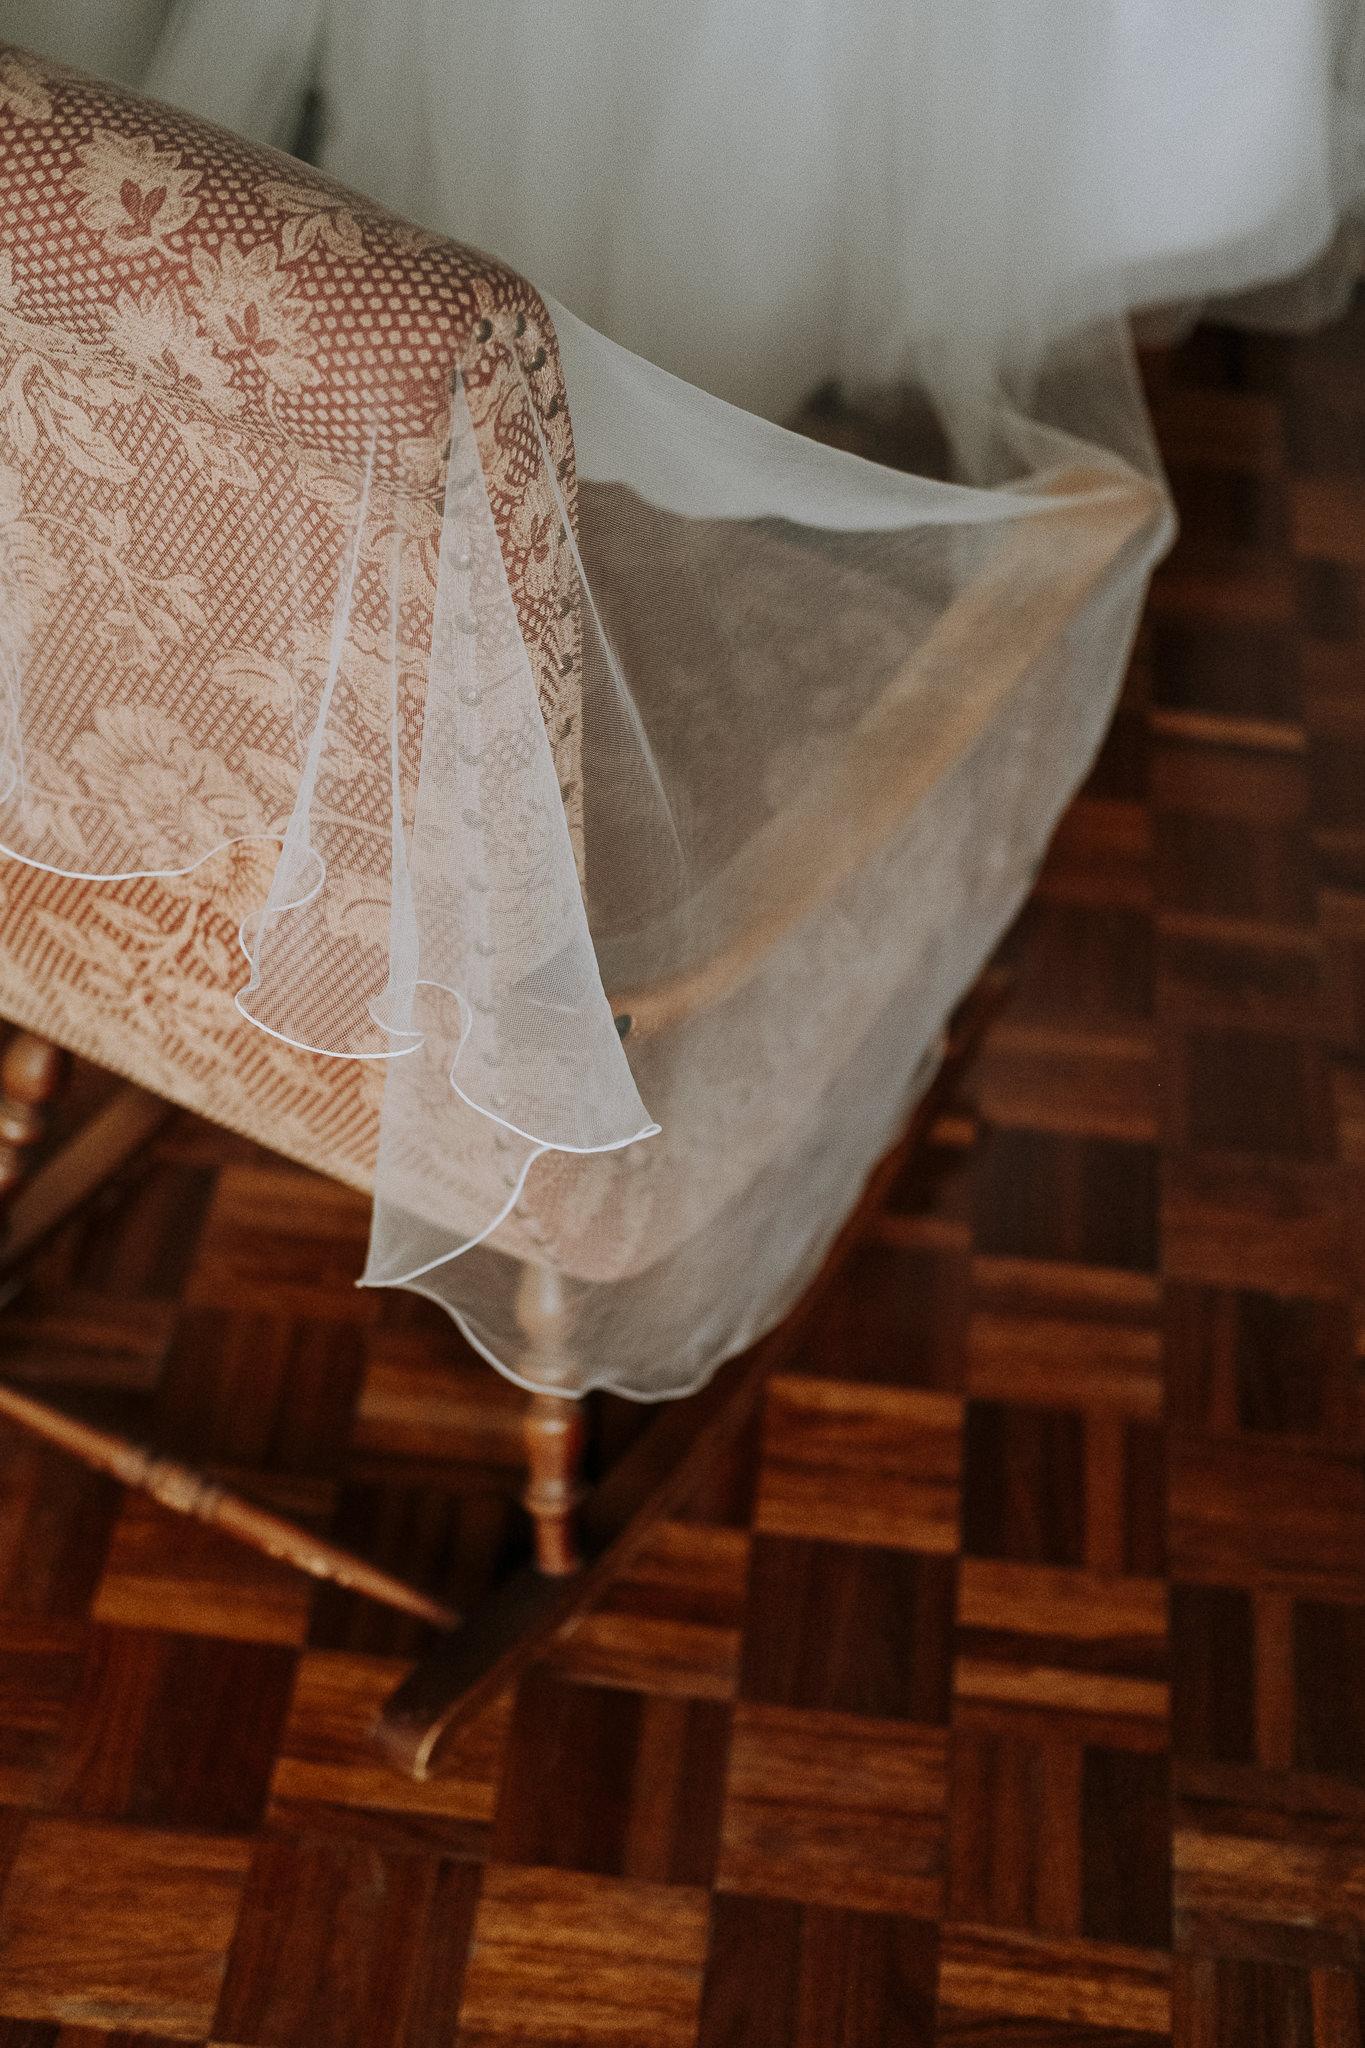 Fotografo Matrimonio Dettagli Velo Sposa